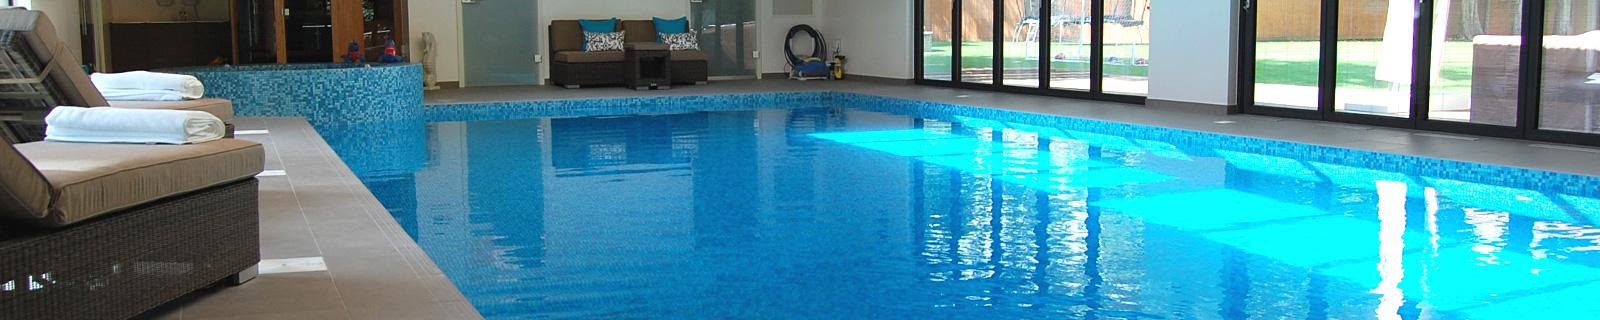 Indoor Pool Gallery Buckland Pool Reigate Surrey